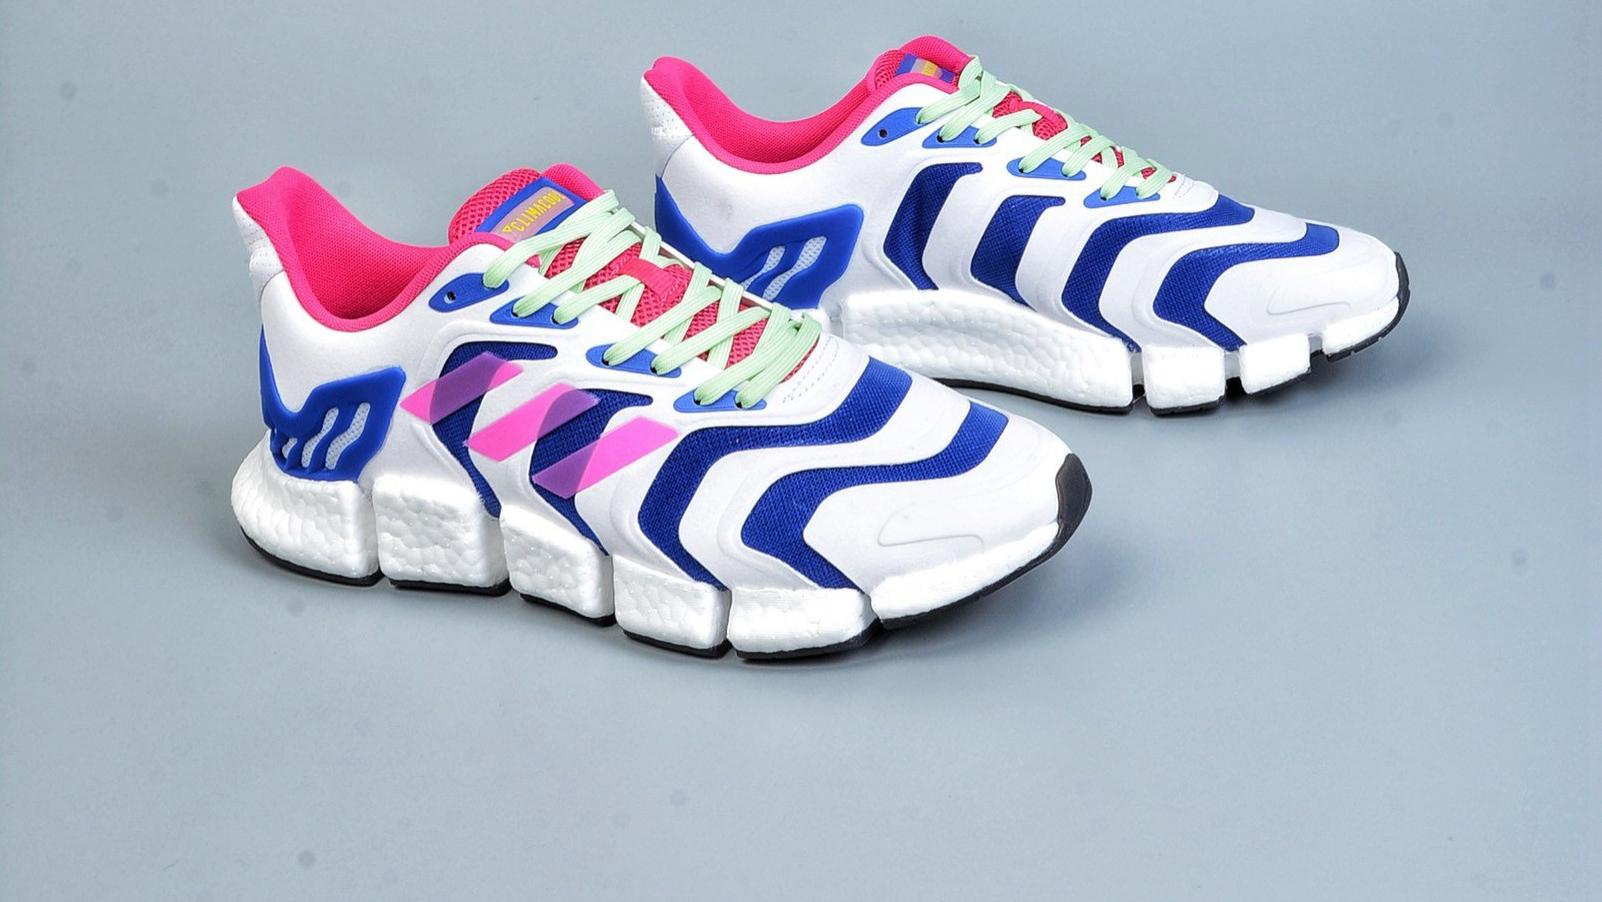 adidas Climacool Boost 清风跑鞋